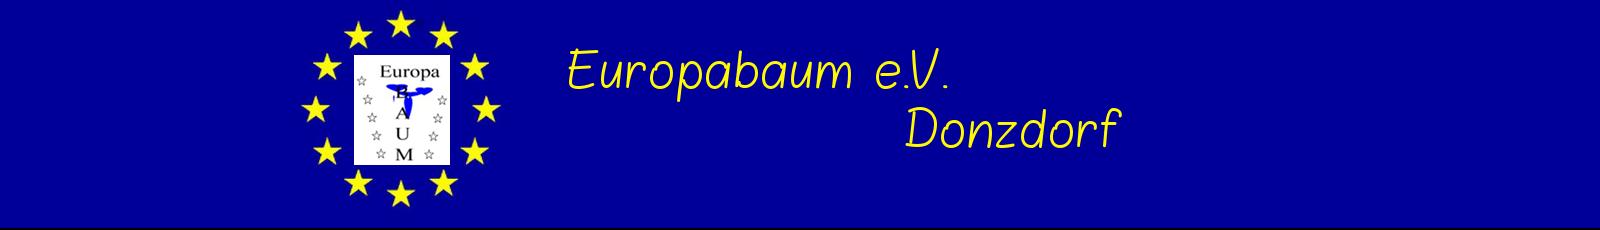 Europabaum e.V.